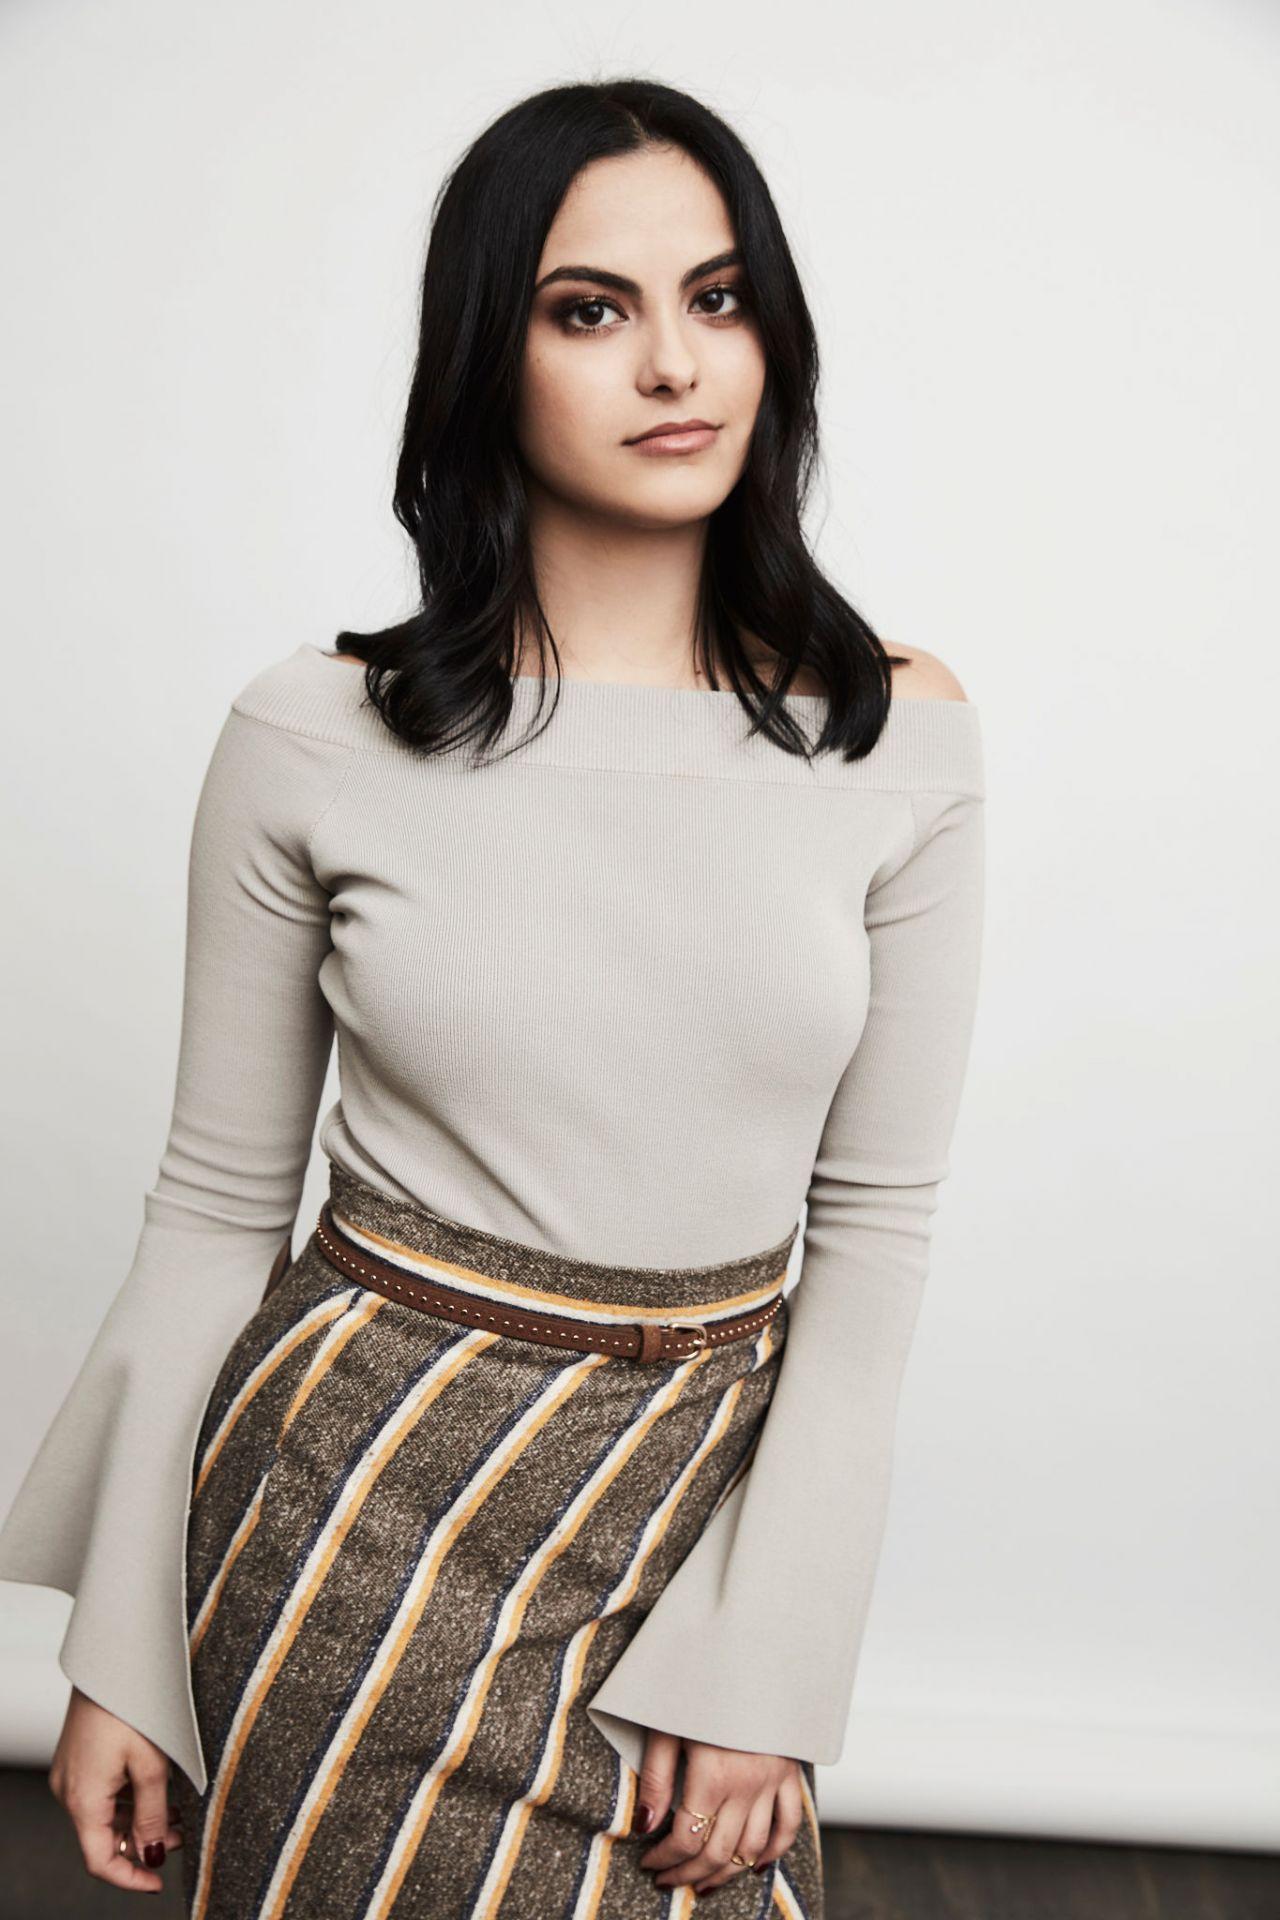 Goddess PaigeMalfoy aka Paige (Alex IRL)